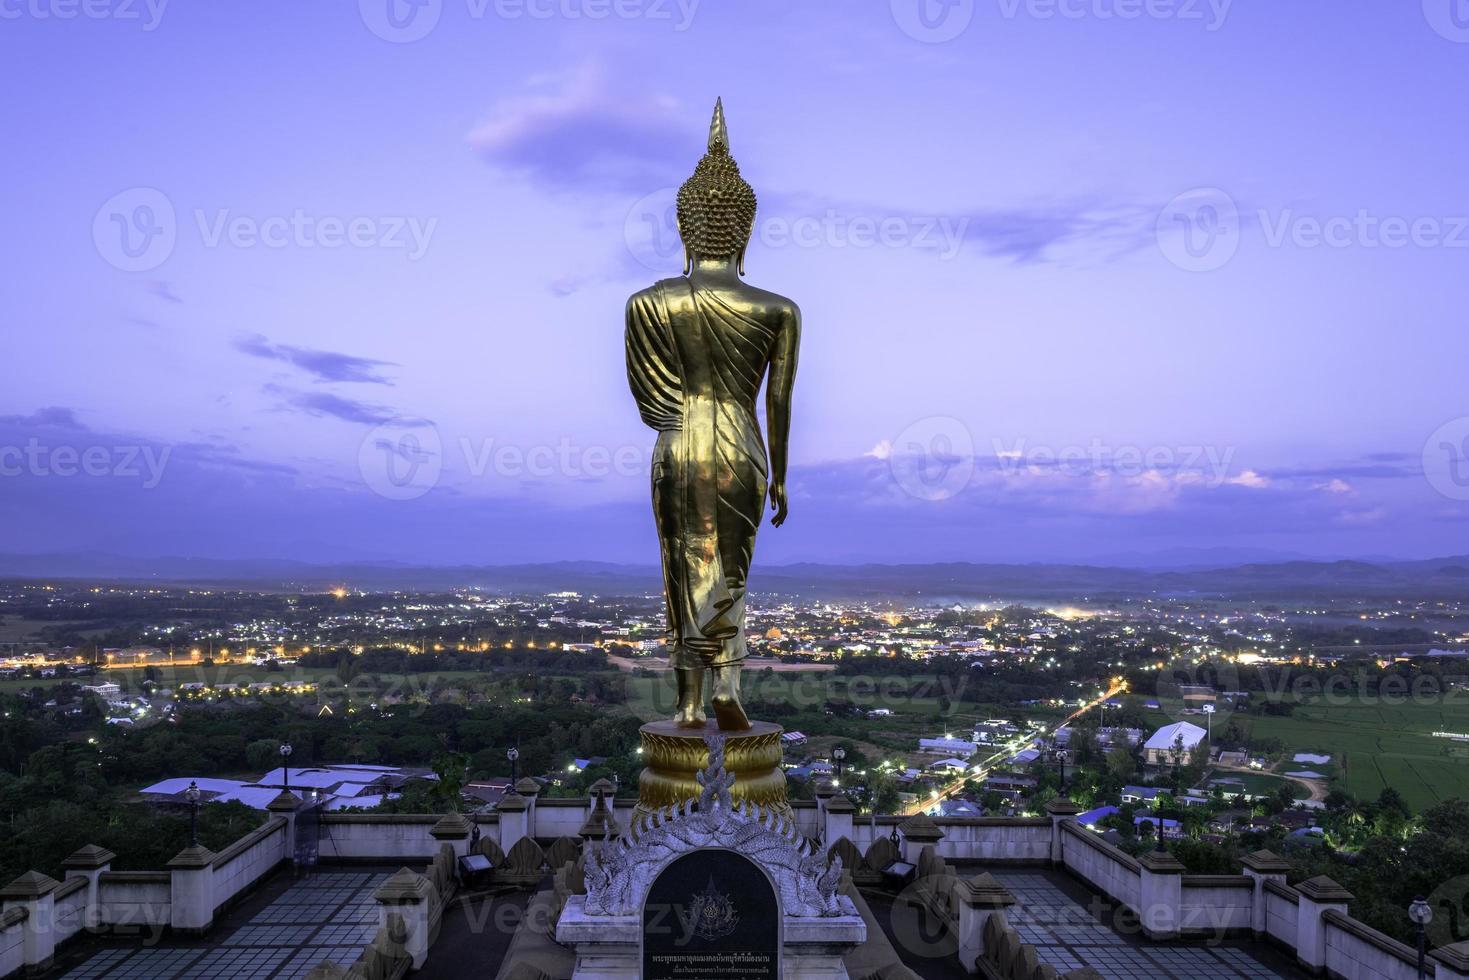 Estatua dorada de Buda en el templo de Khao Noi, provincia de Nan, Tailandia foto